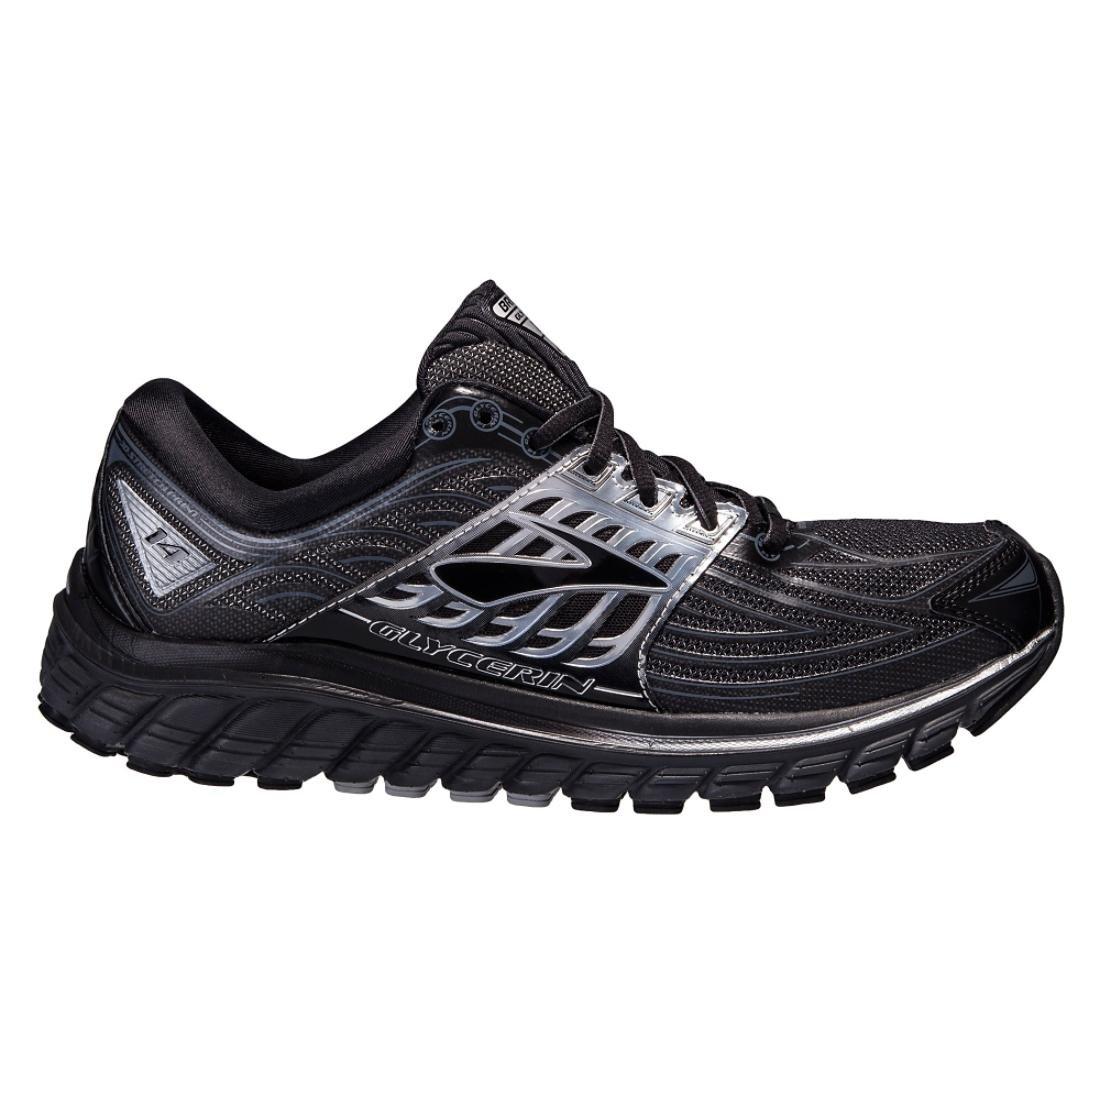 Brooks Glycerin 14, Zapatillas de Running para Hombre 49.5 EU|Black/Anthracite/Silver